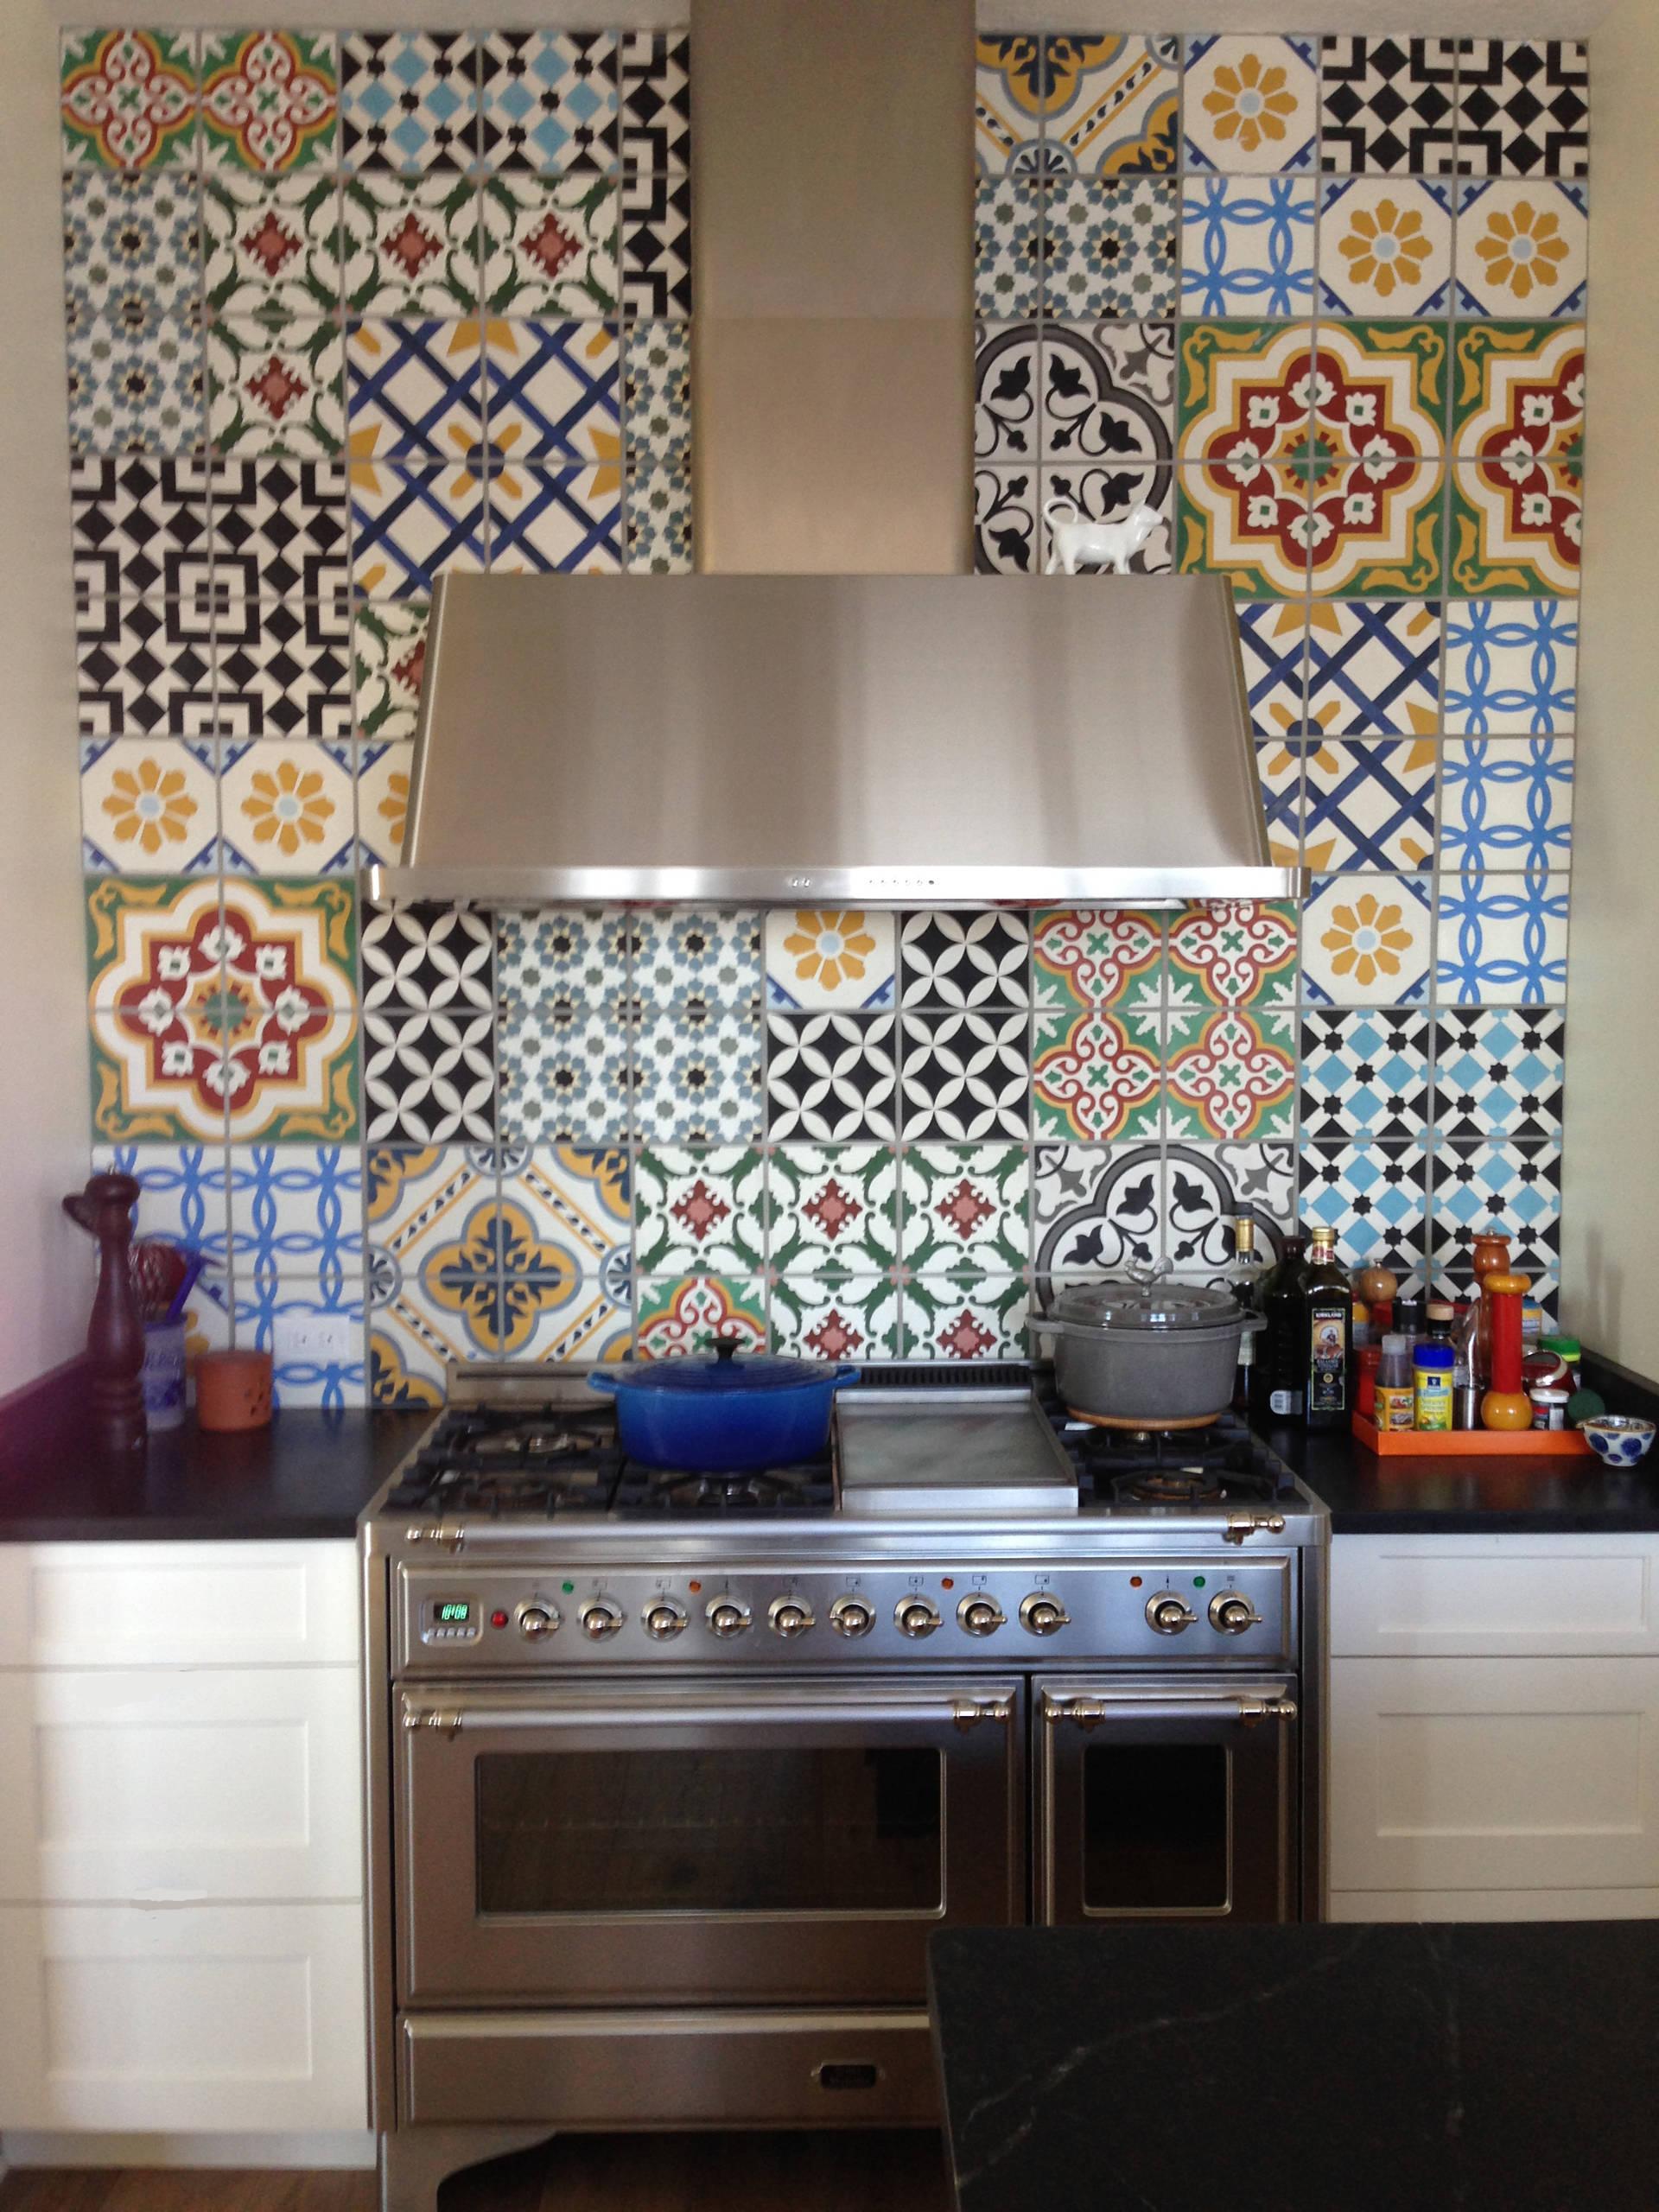 Interchangeable Tile Backsplash Ideas Photos Houzz